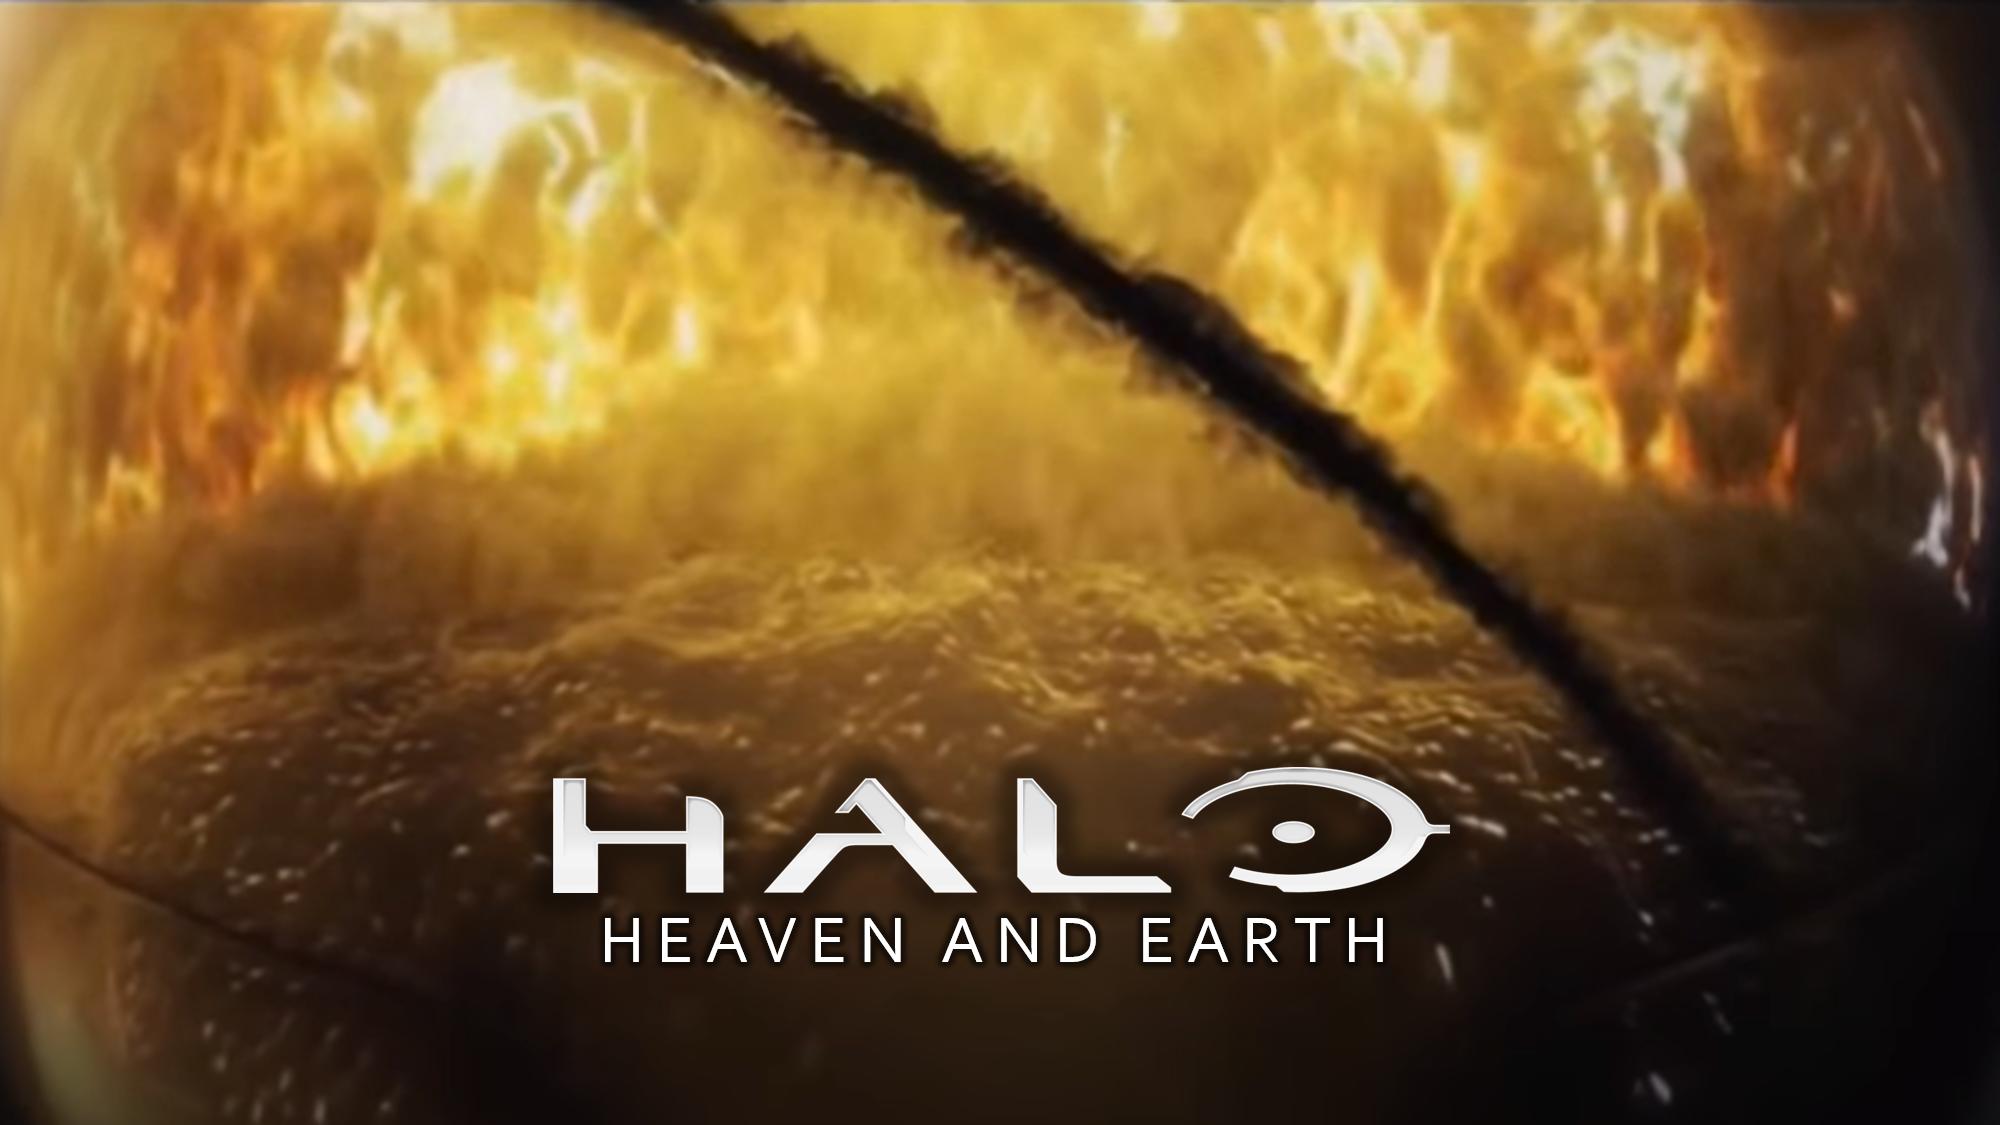 Halo: Heaven and Earth